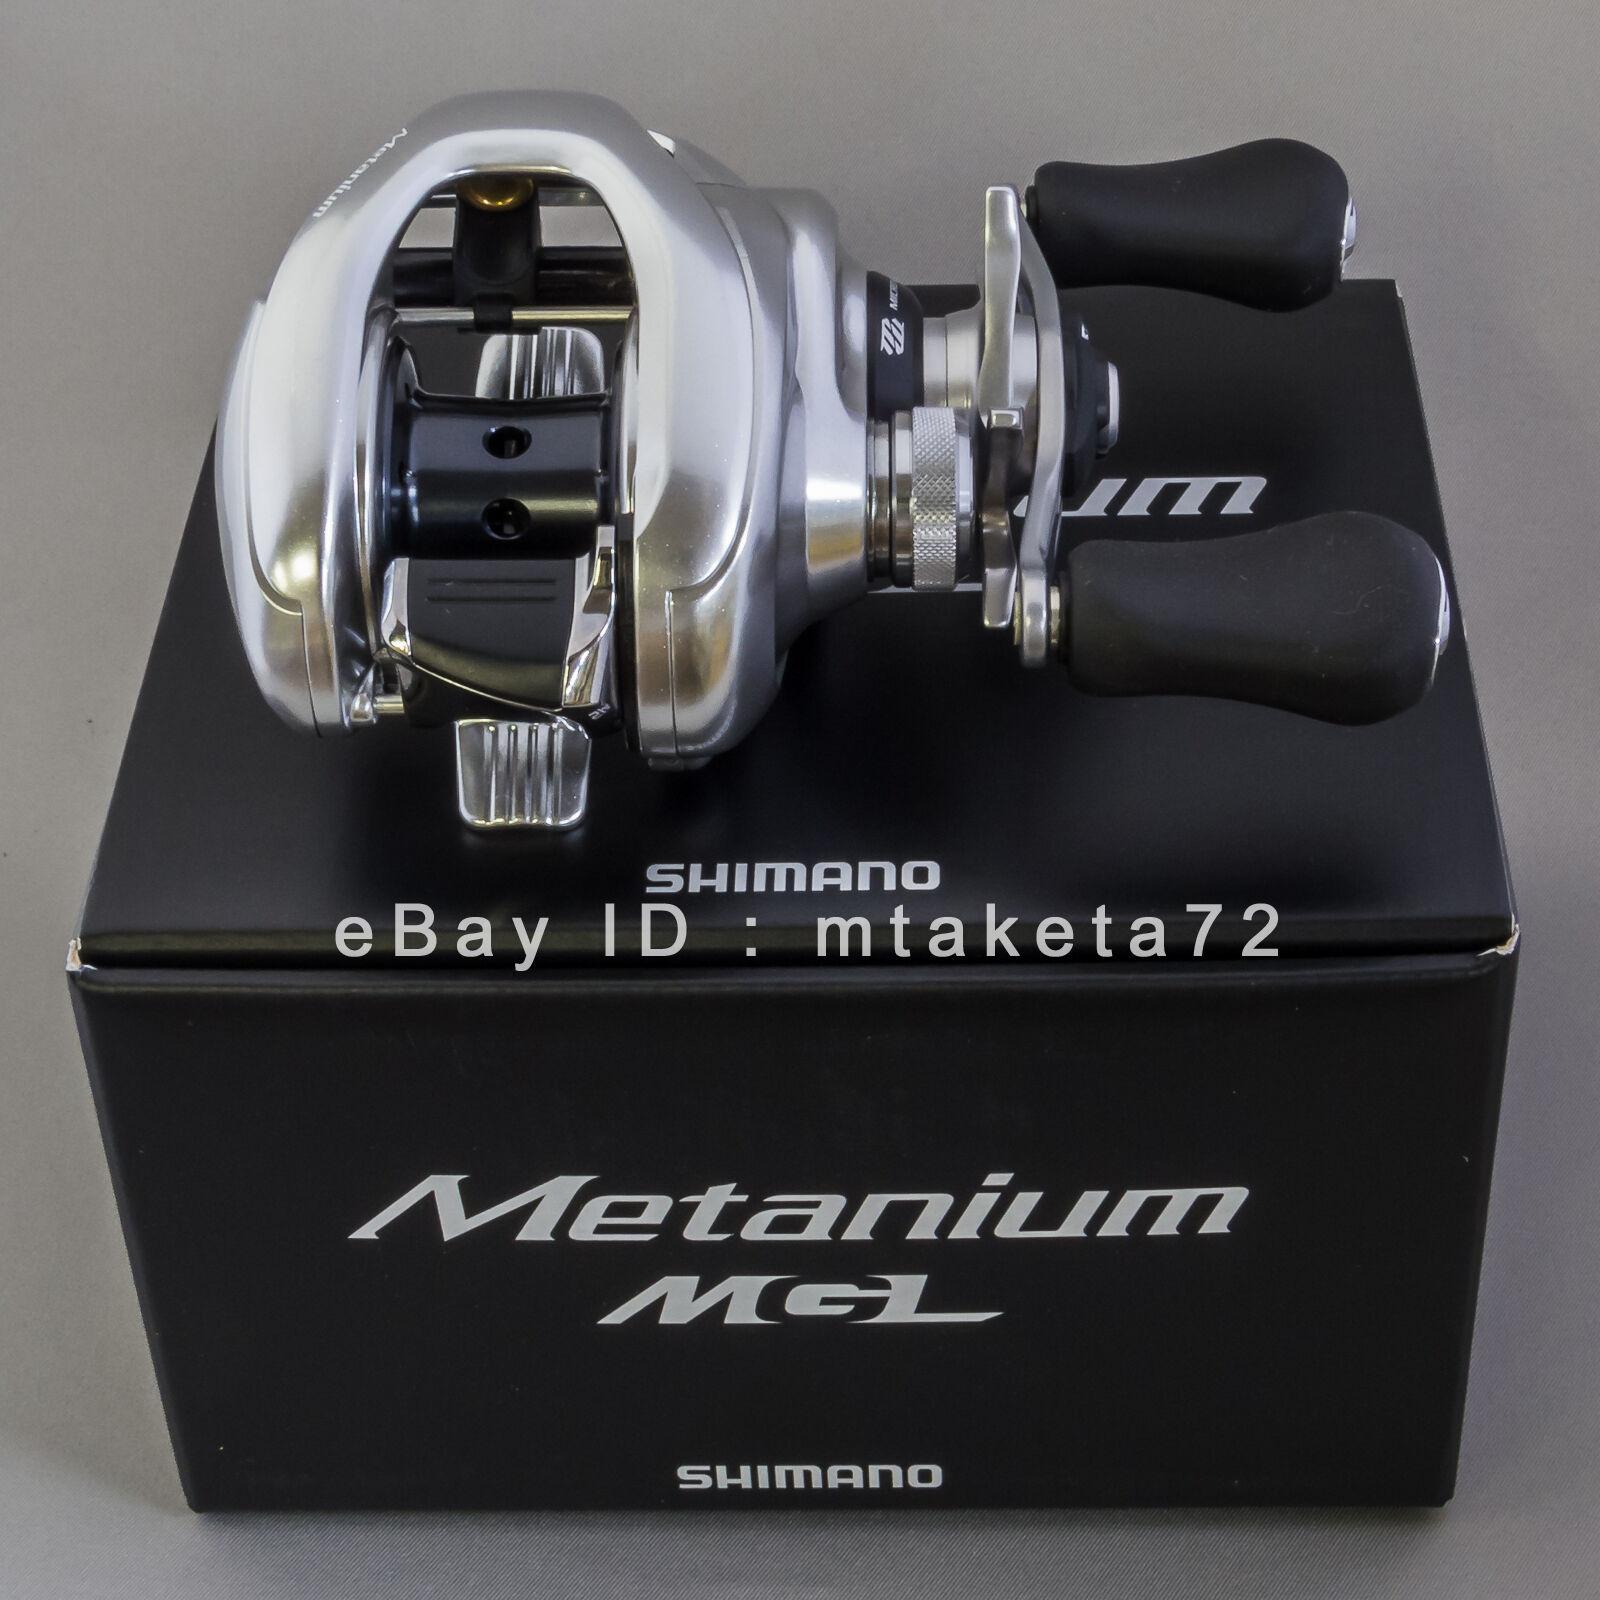 Shimano 16 Metanium MGL, Gear Ratio 6.2:1, Right Handle, Japan Model, 035301